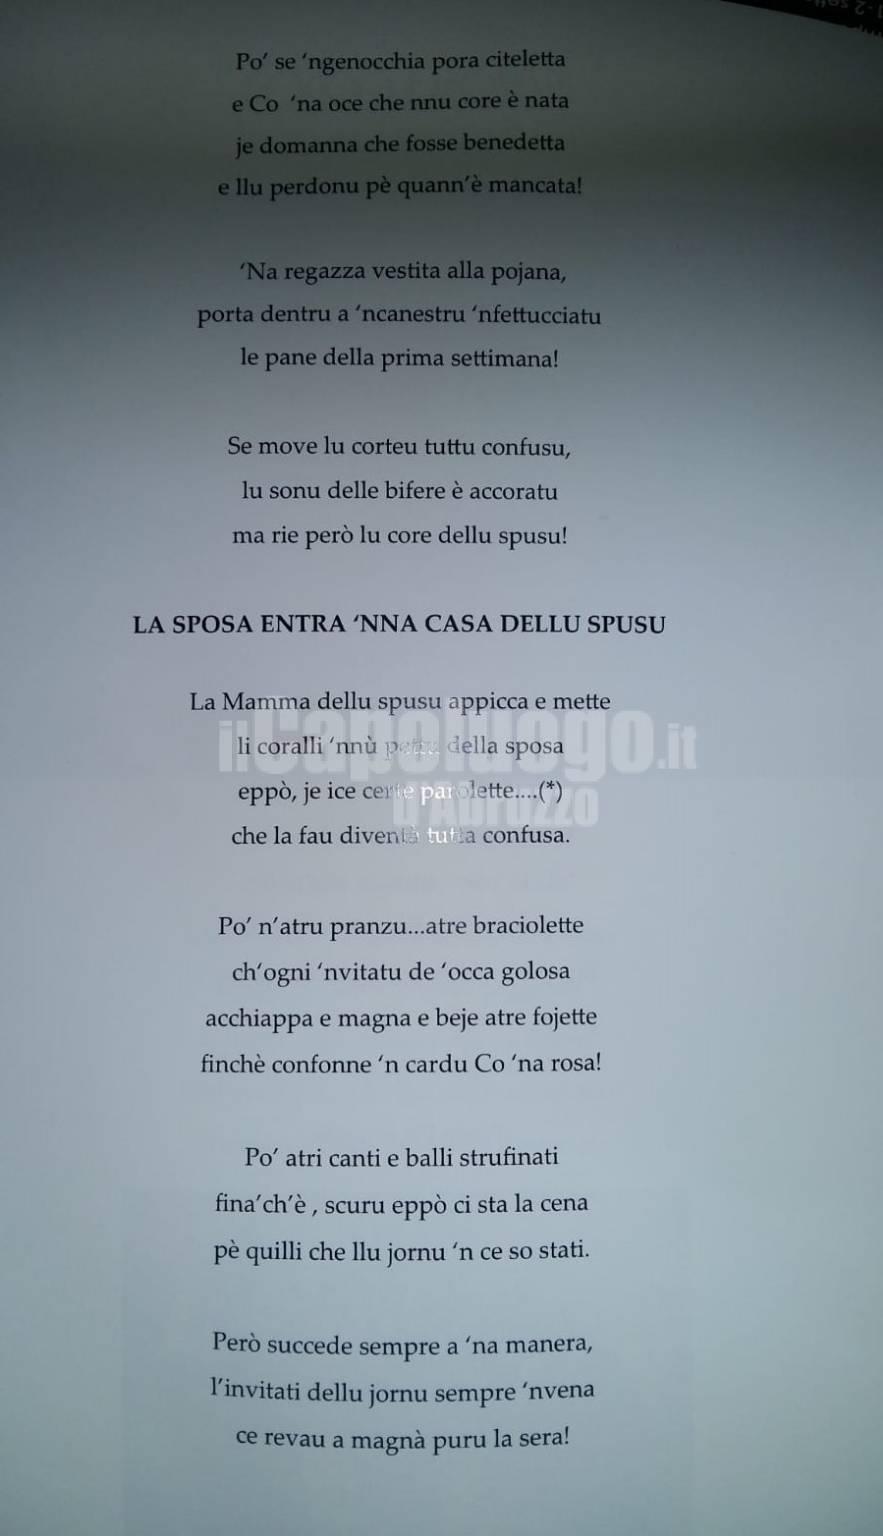 sposa pojana poesie paolo de angelis